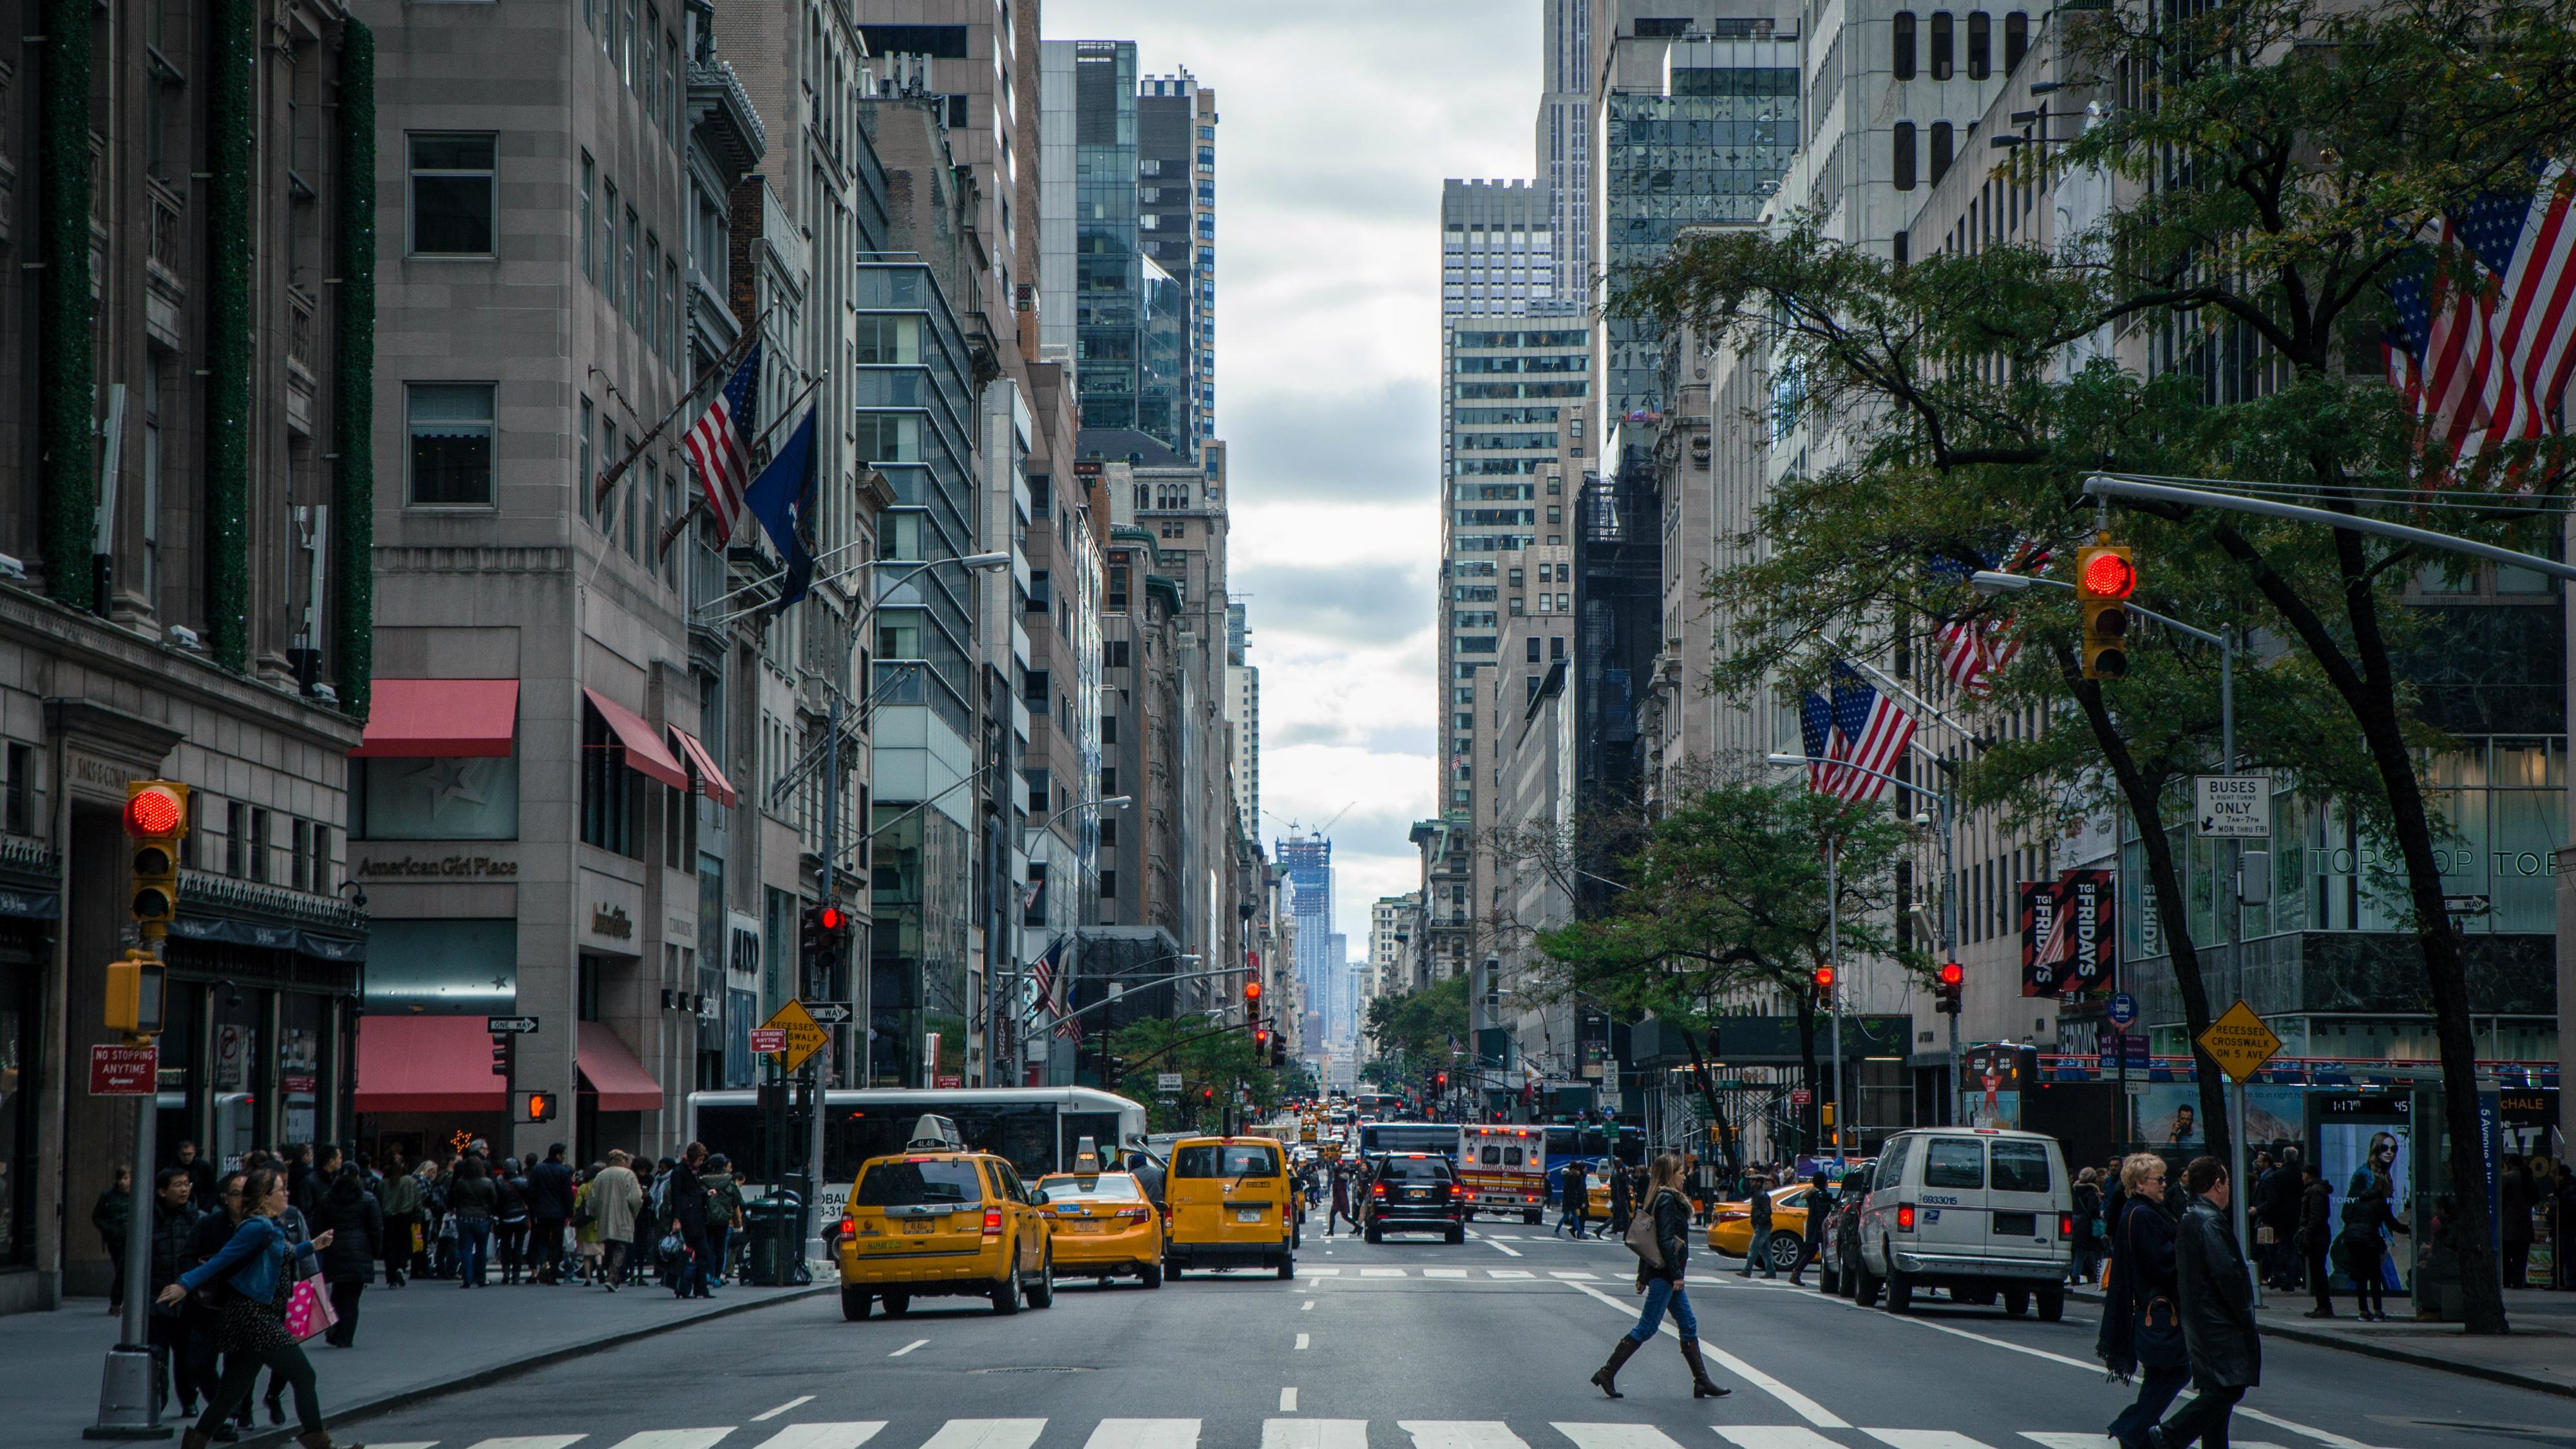 A New York street scene